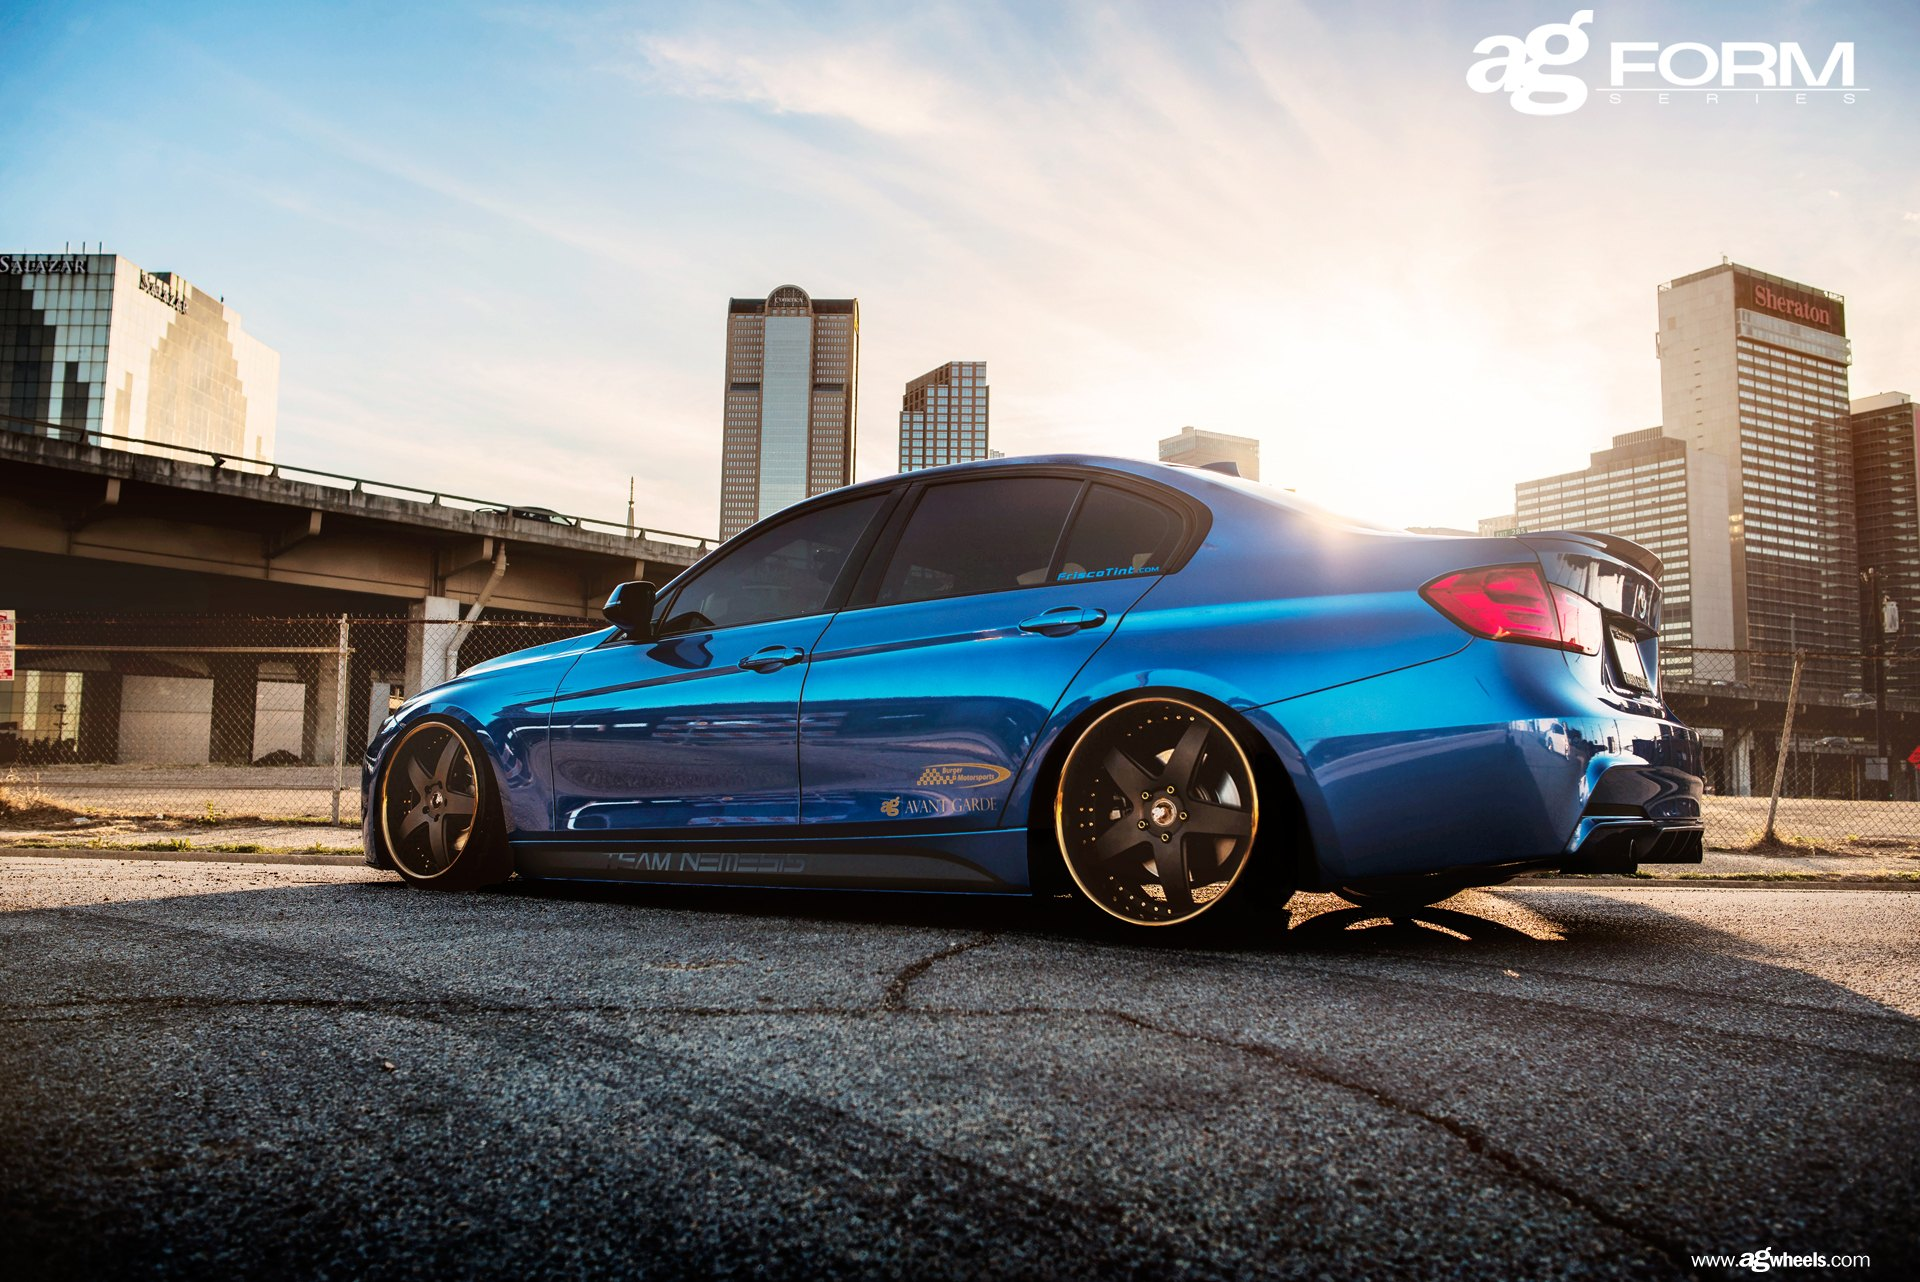 Bright Blue Bmw M3 F30 With A Proper Stance By Avant Garde Carid